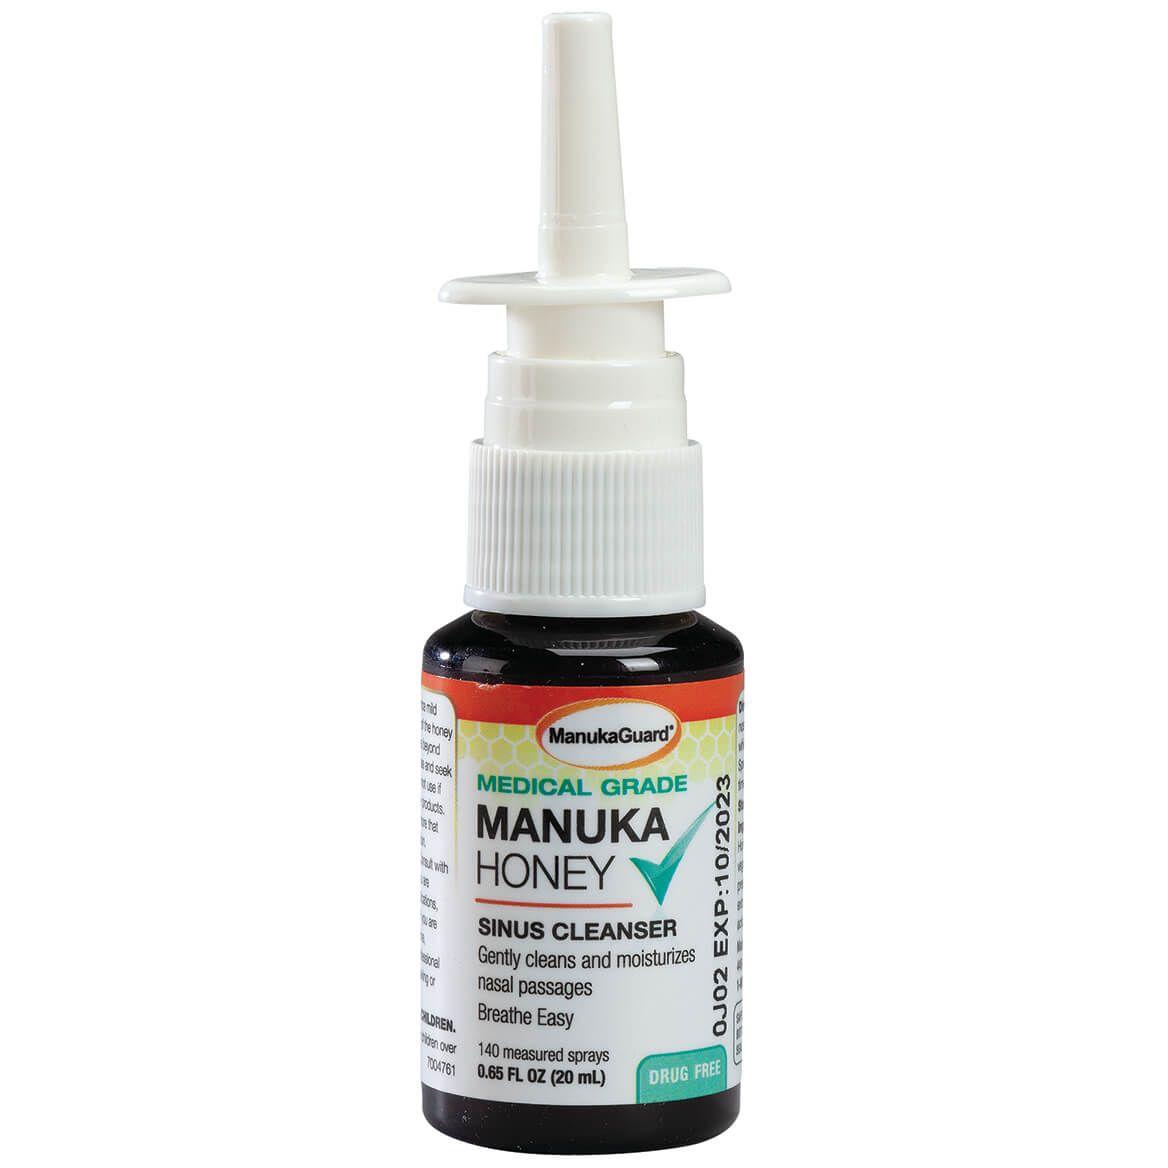 ManukaGuard® Medical Grade Manuka Honey Sinus Cleanser Spray-371939